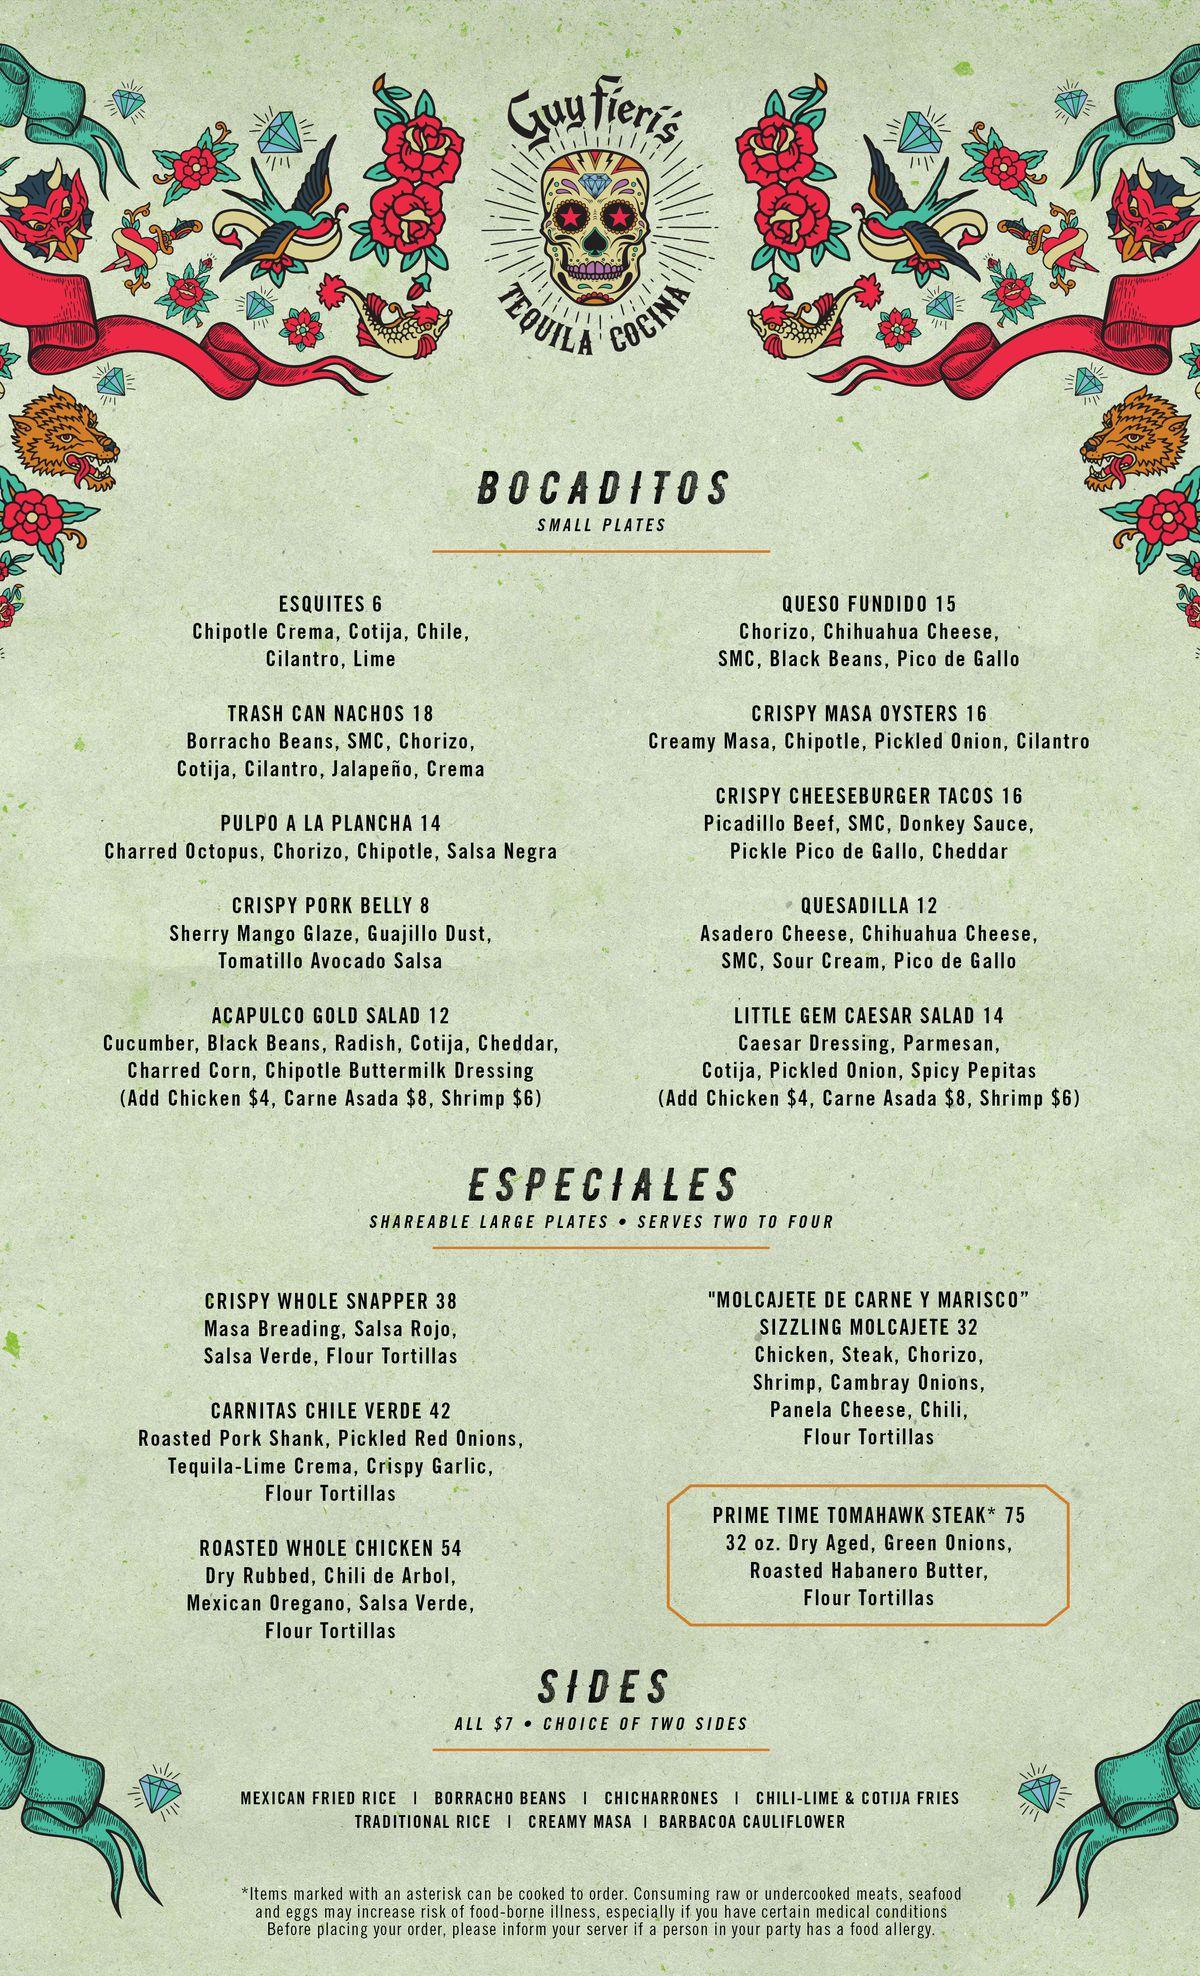 Guy Fieri's Tequila Cocina food menu